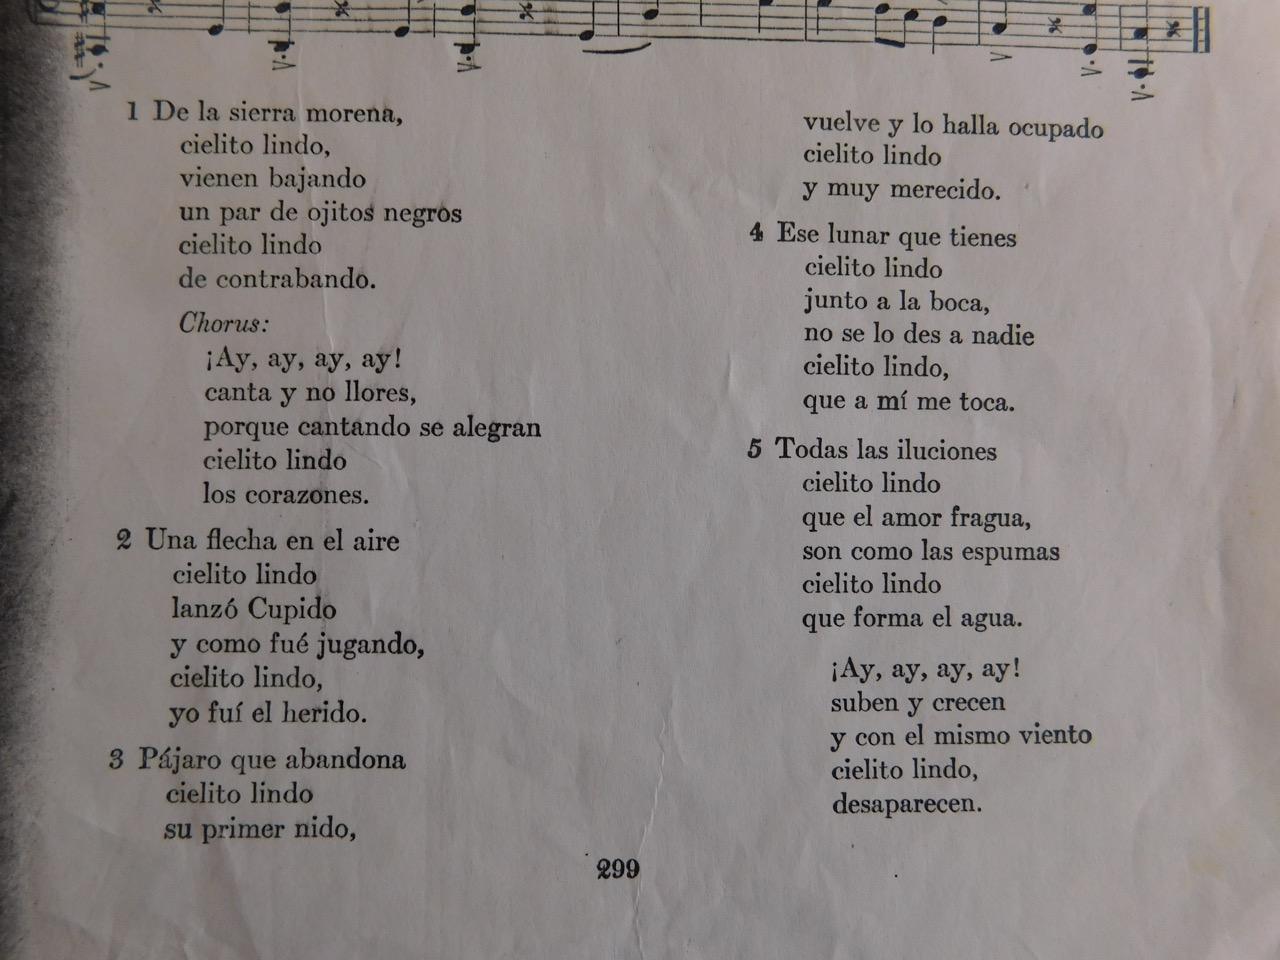 Chords and lyrics cielito lindo lyrics letrag hexwebz Gallery